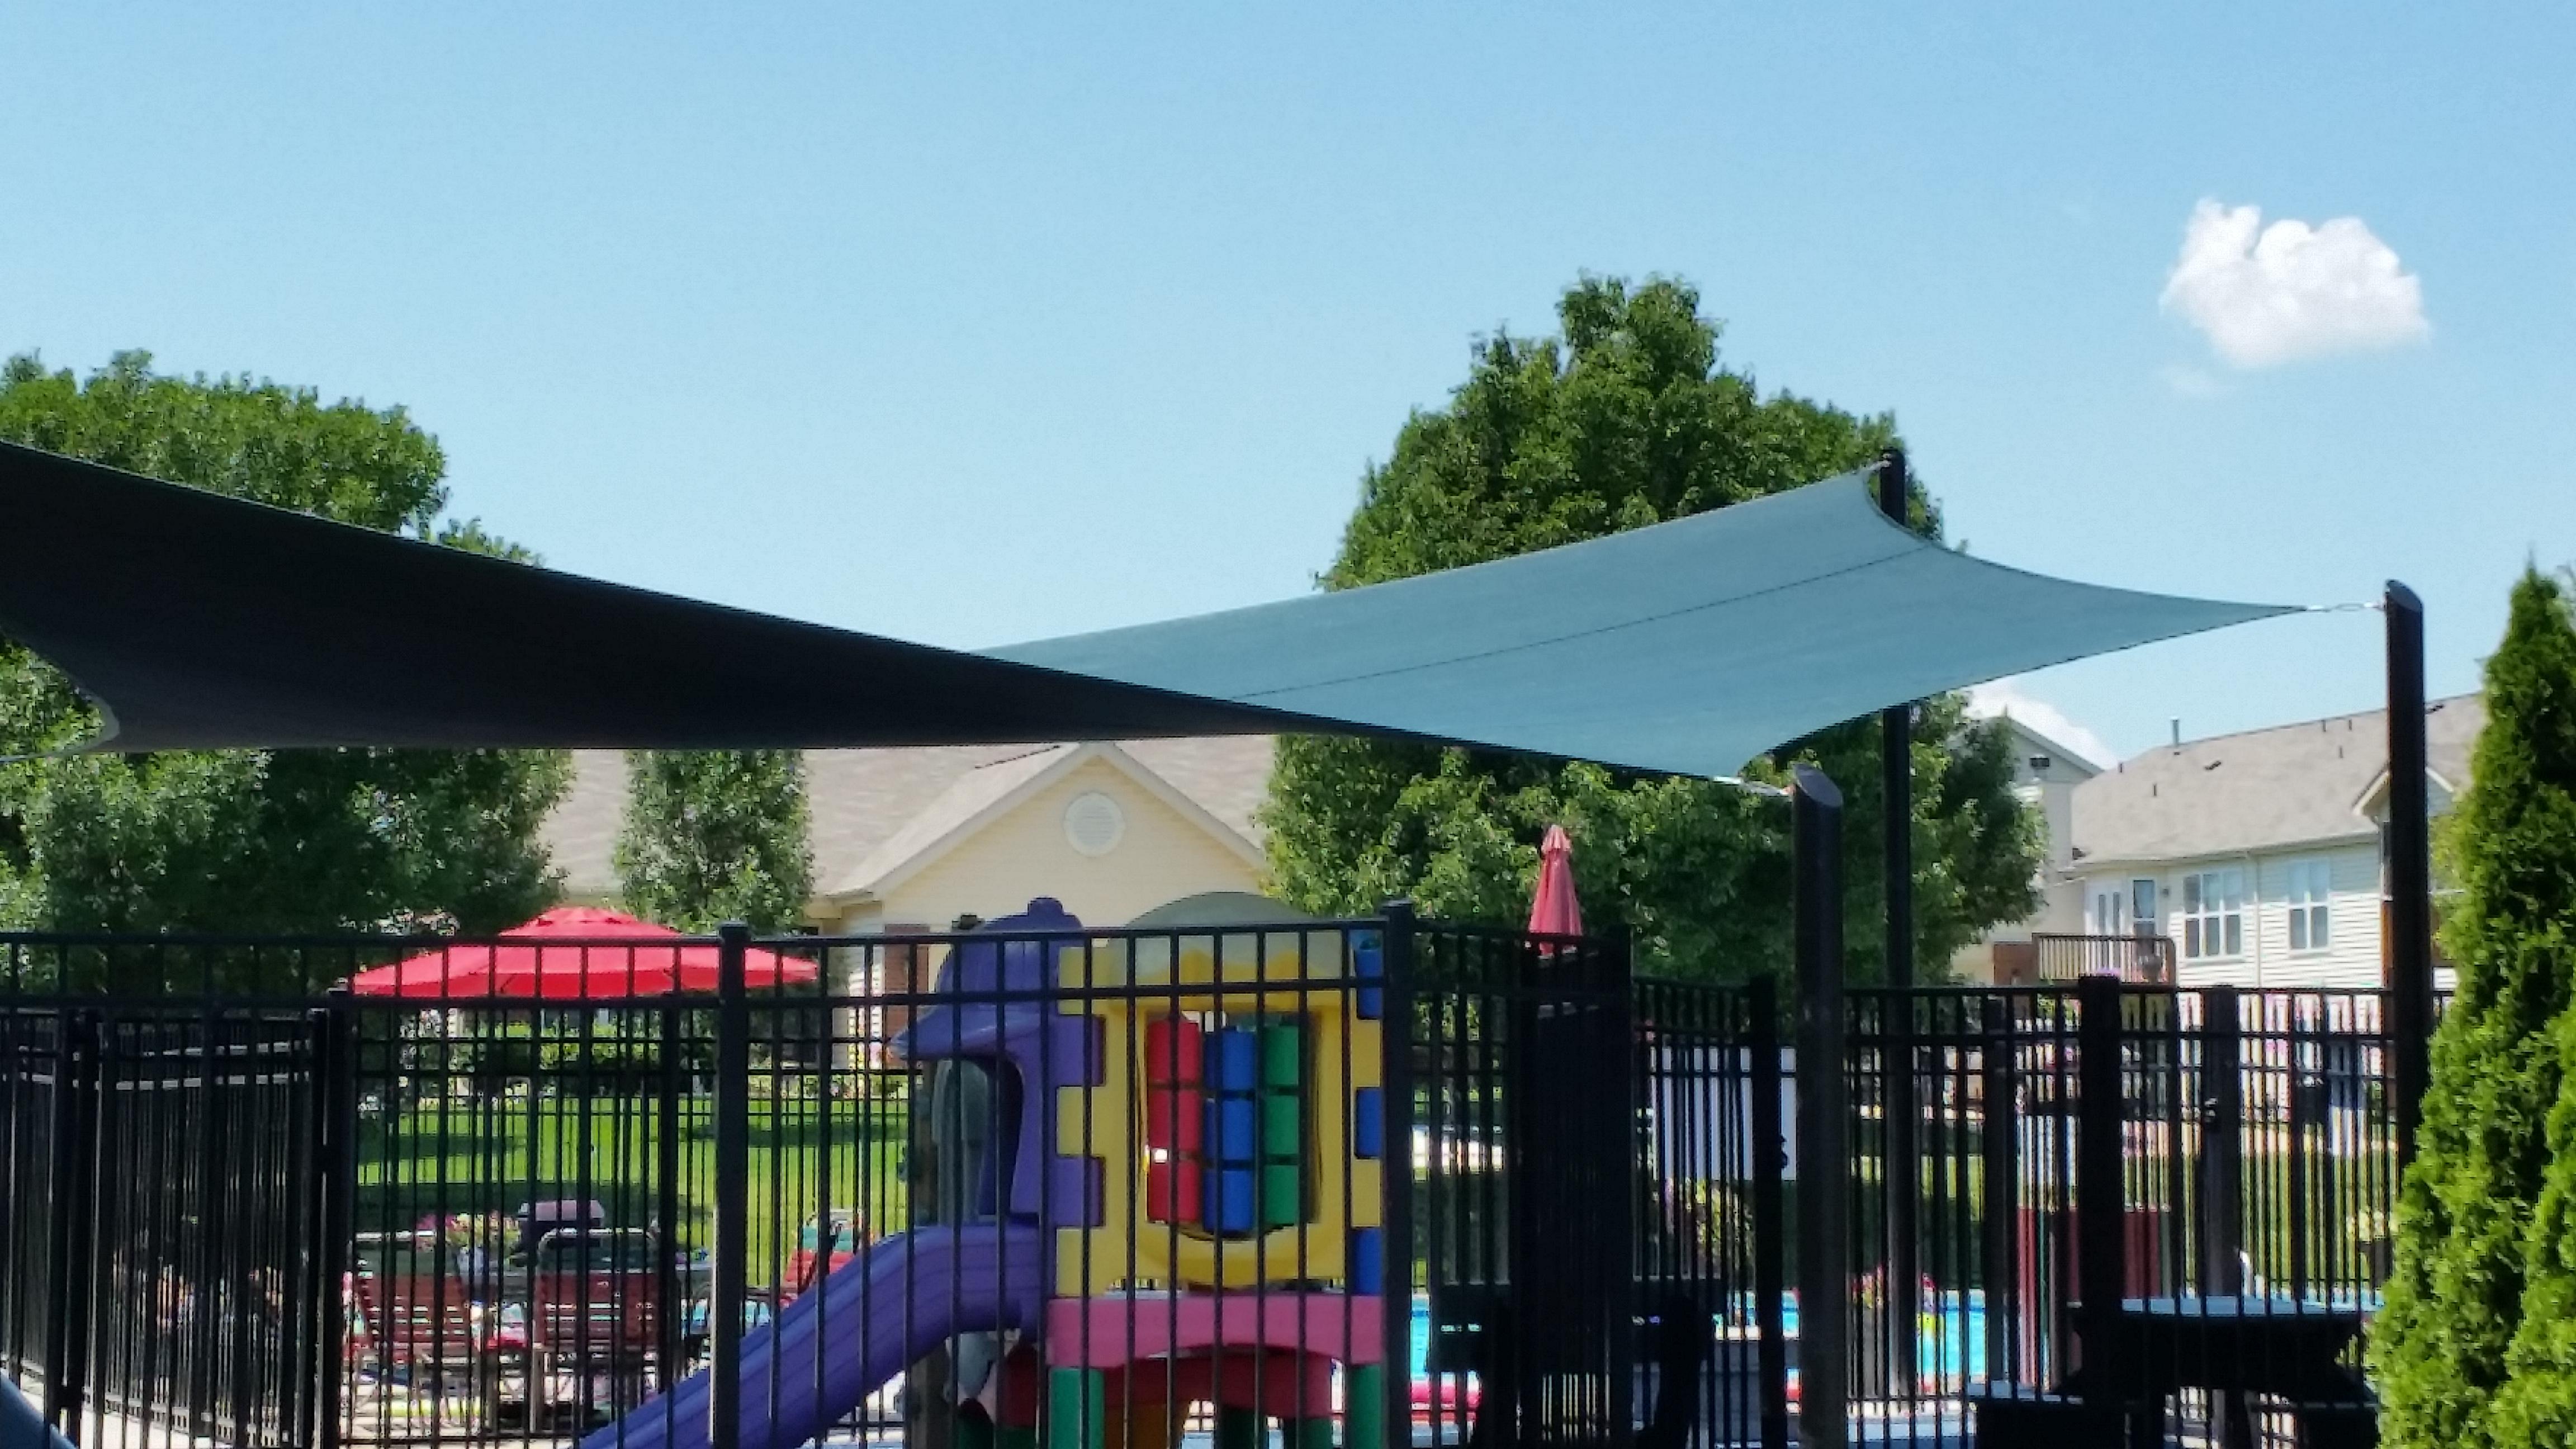 Turtle Creek Playground